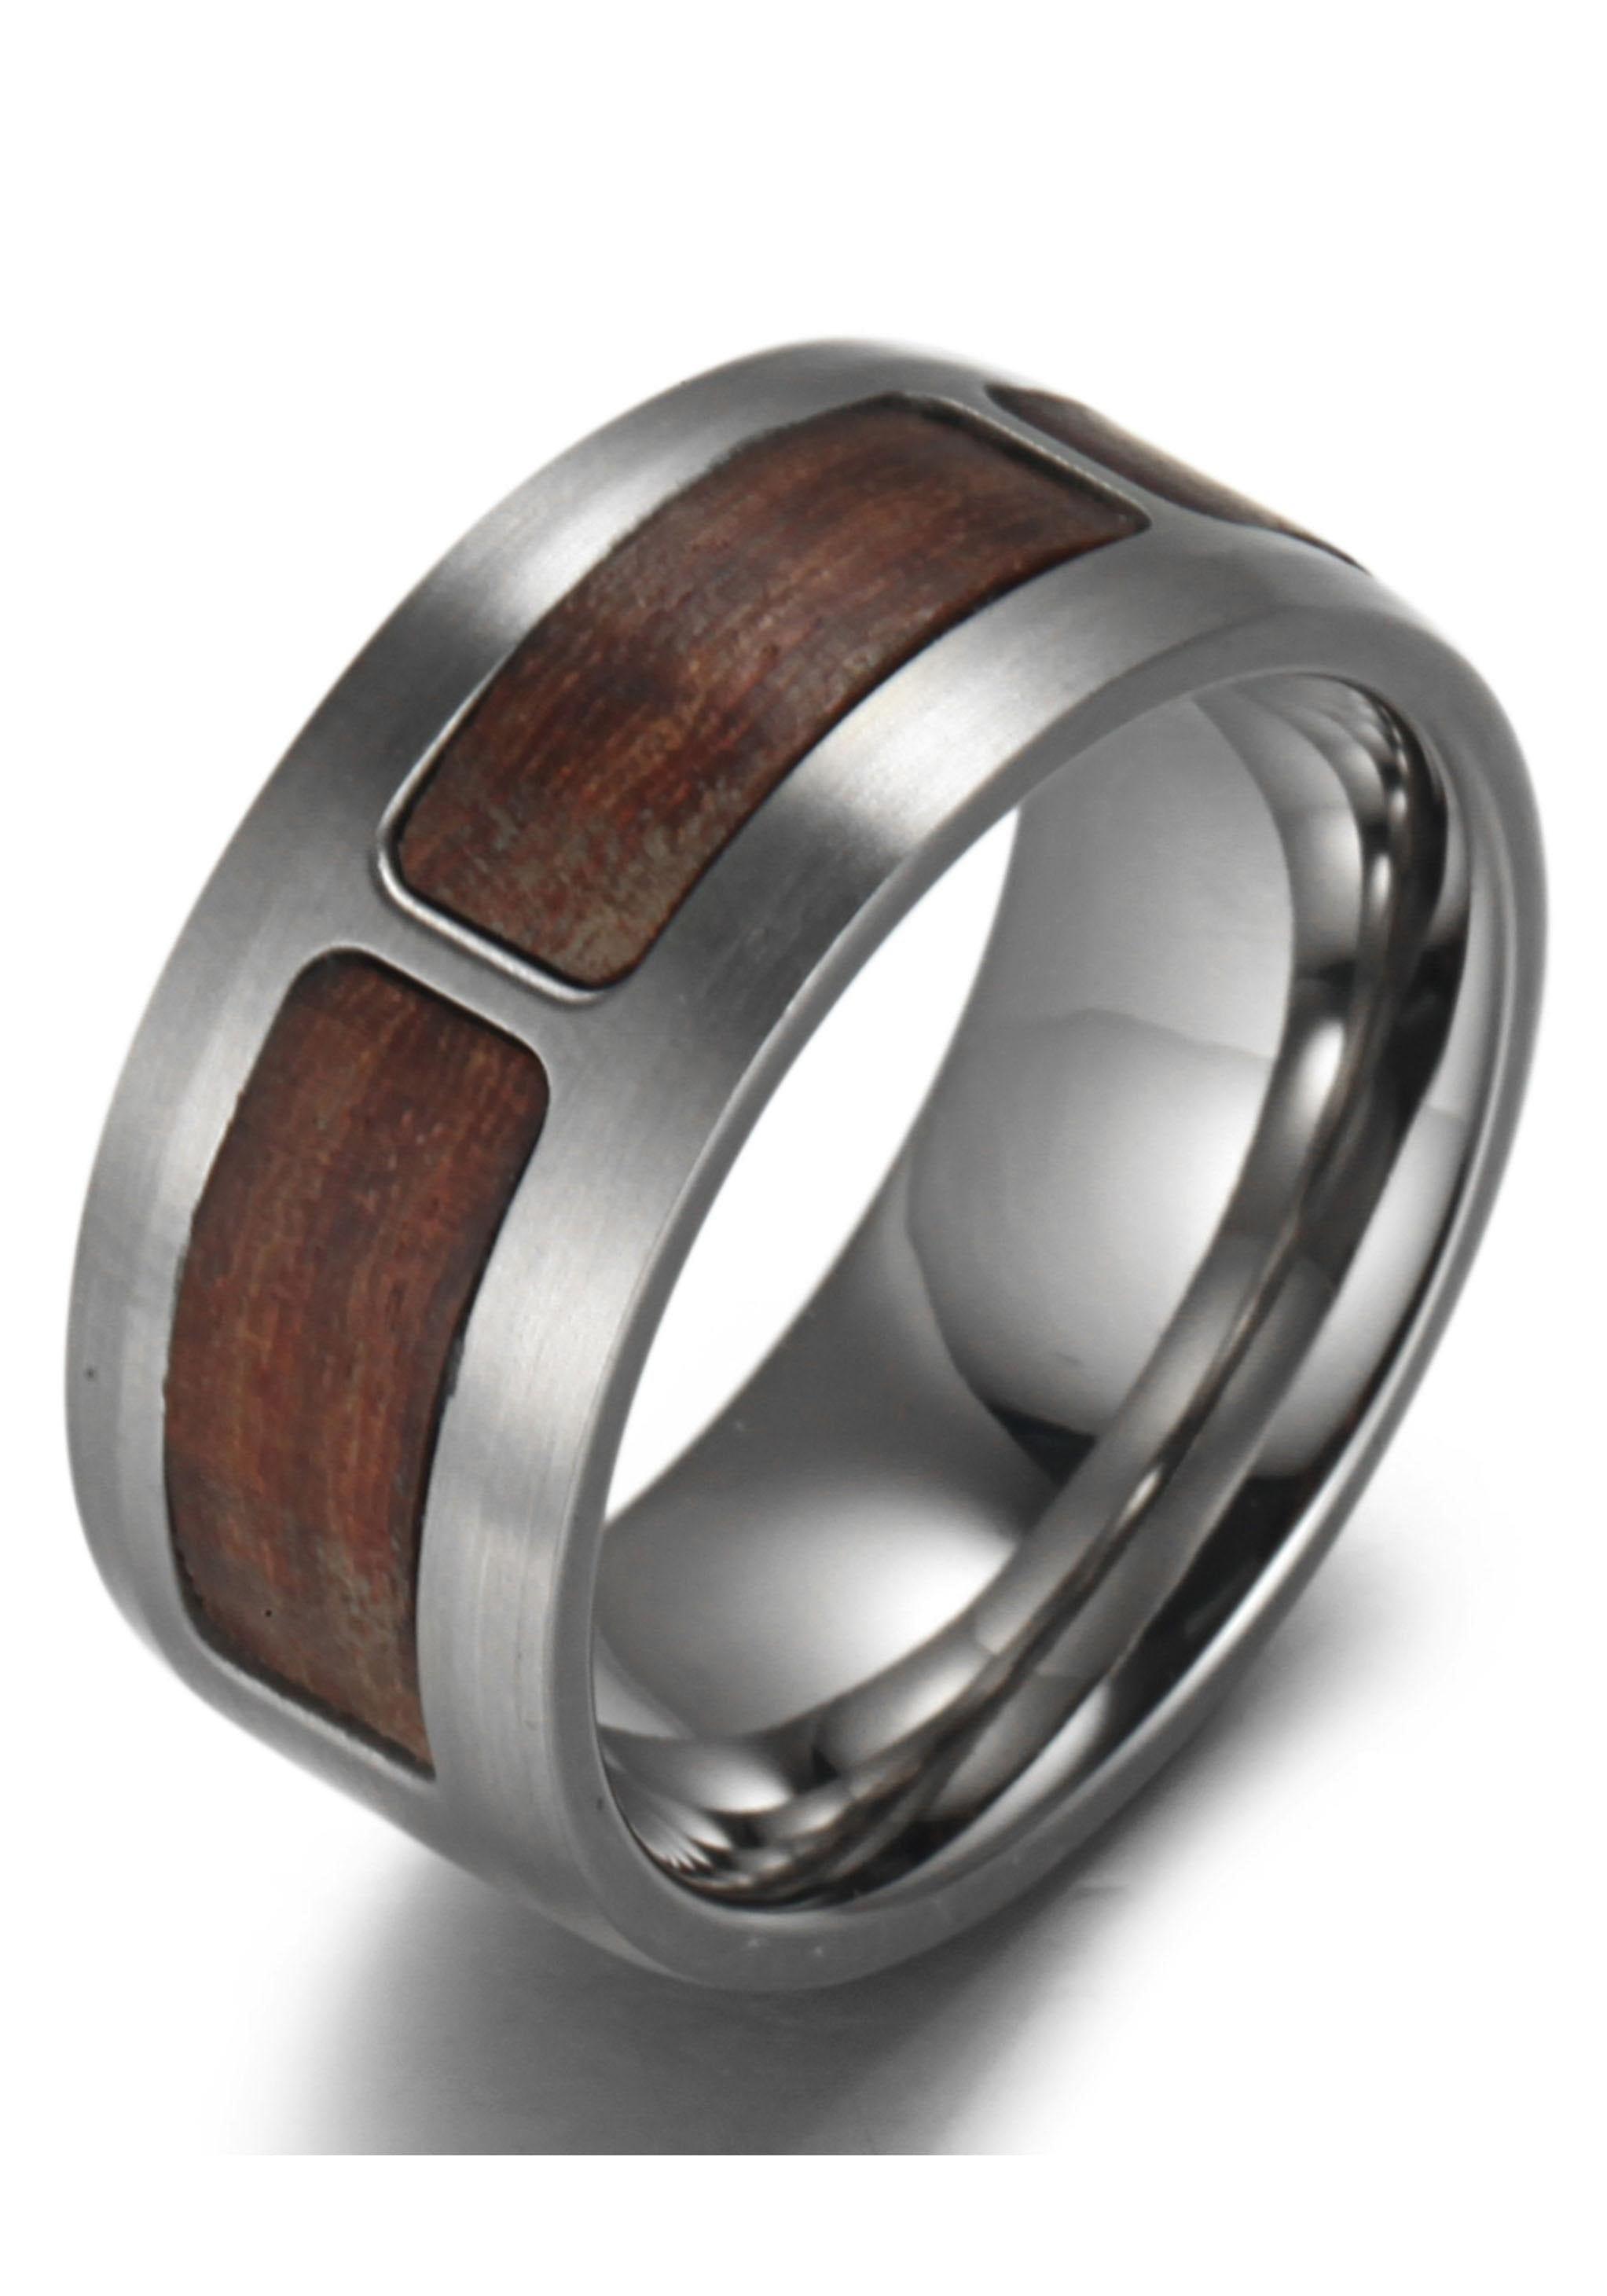 Firetti Fingerring in glänzender und matter Optik | Schmuck > Ringe > Fingerringe | Firetti